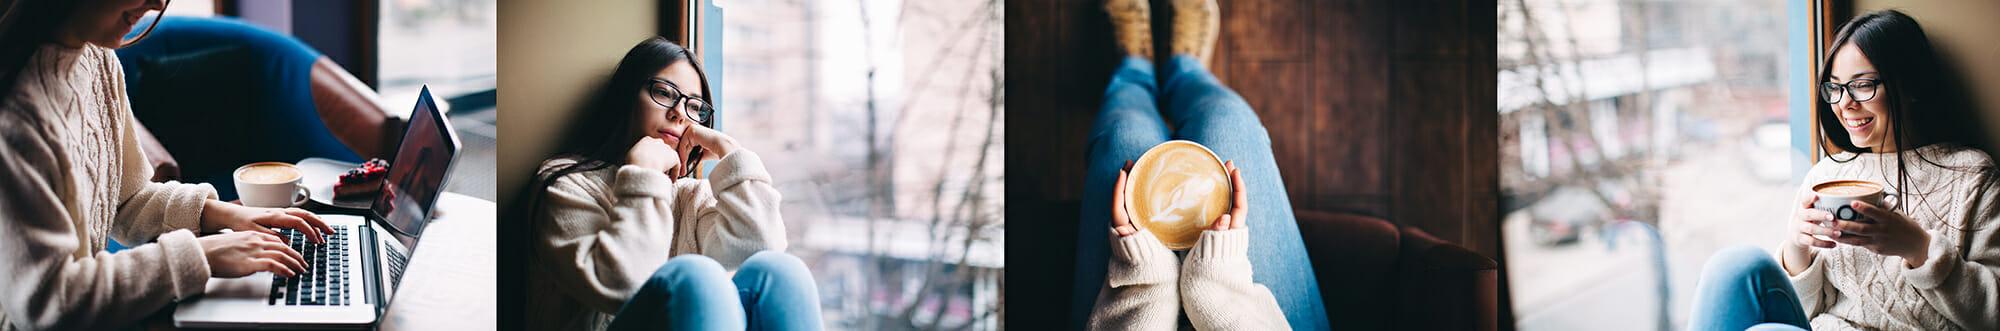 portrait photography ideas girl coffee shop teenager window moody